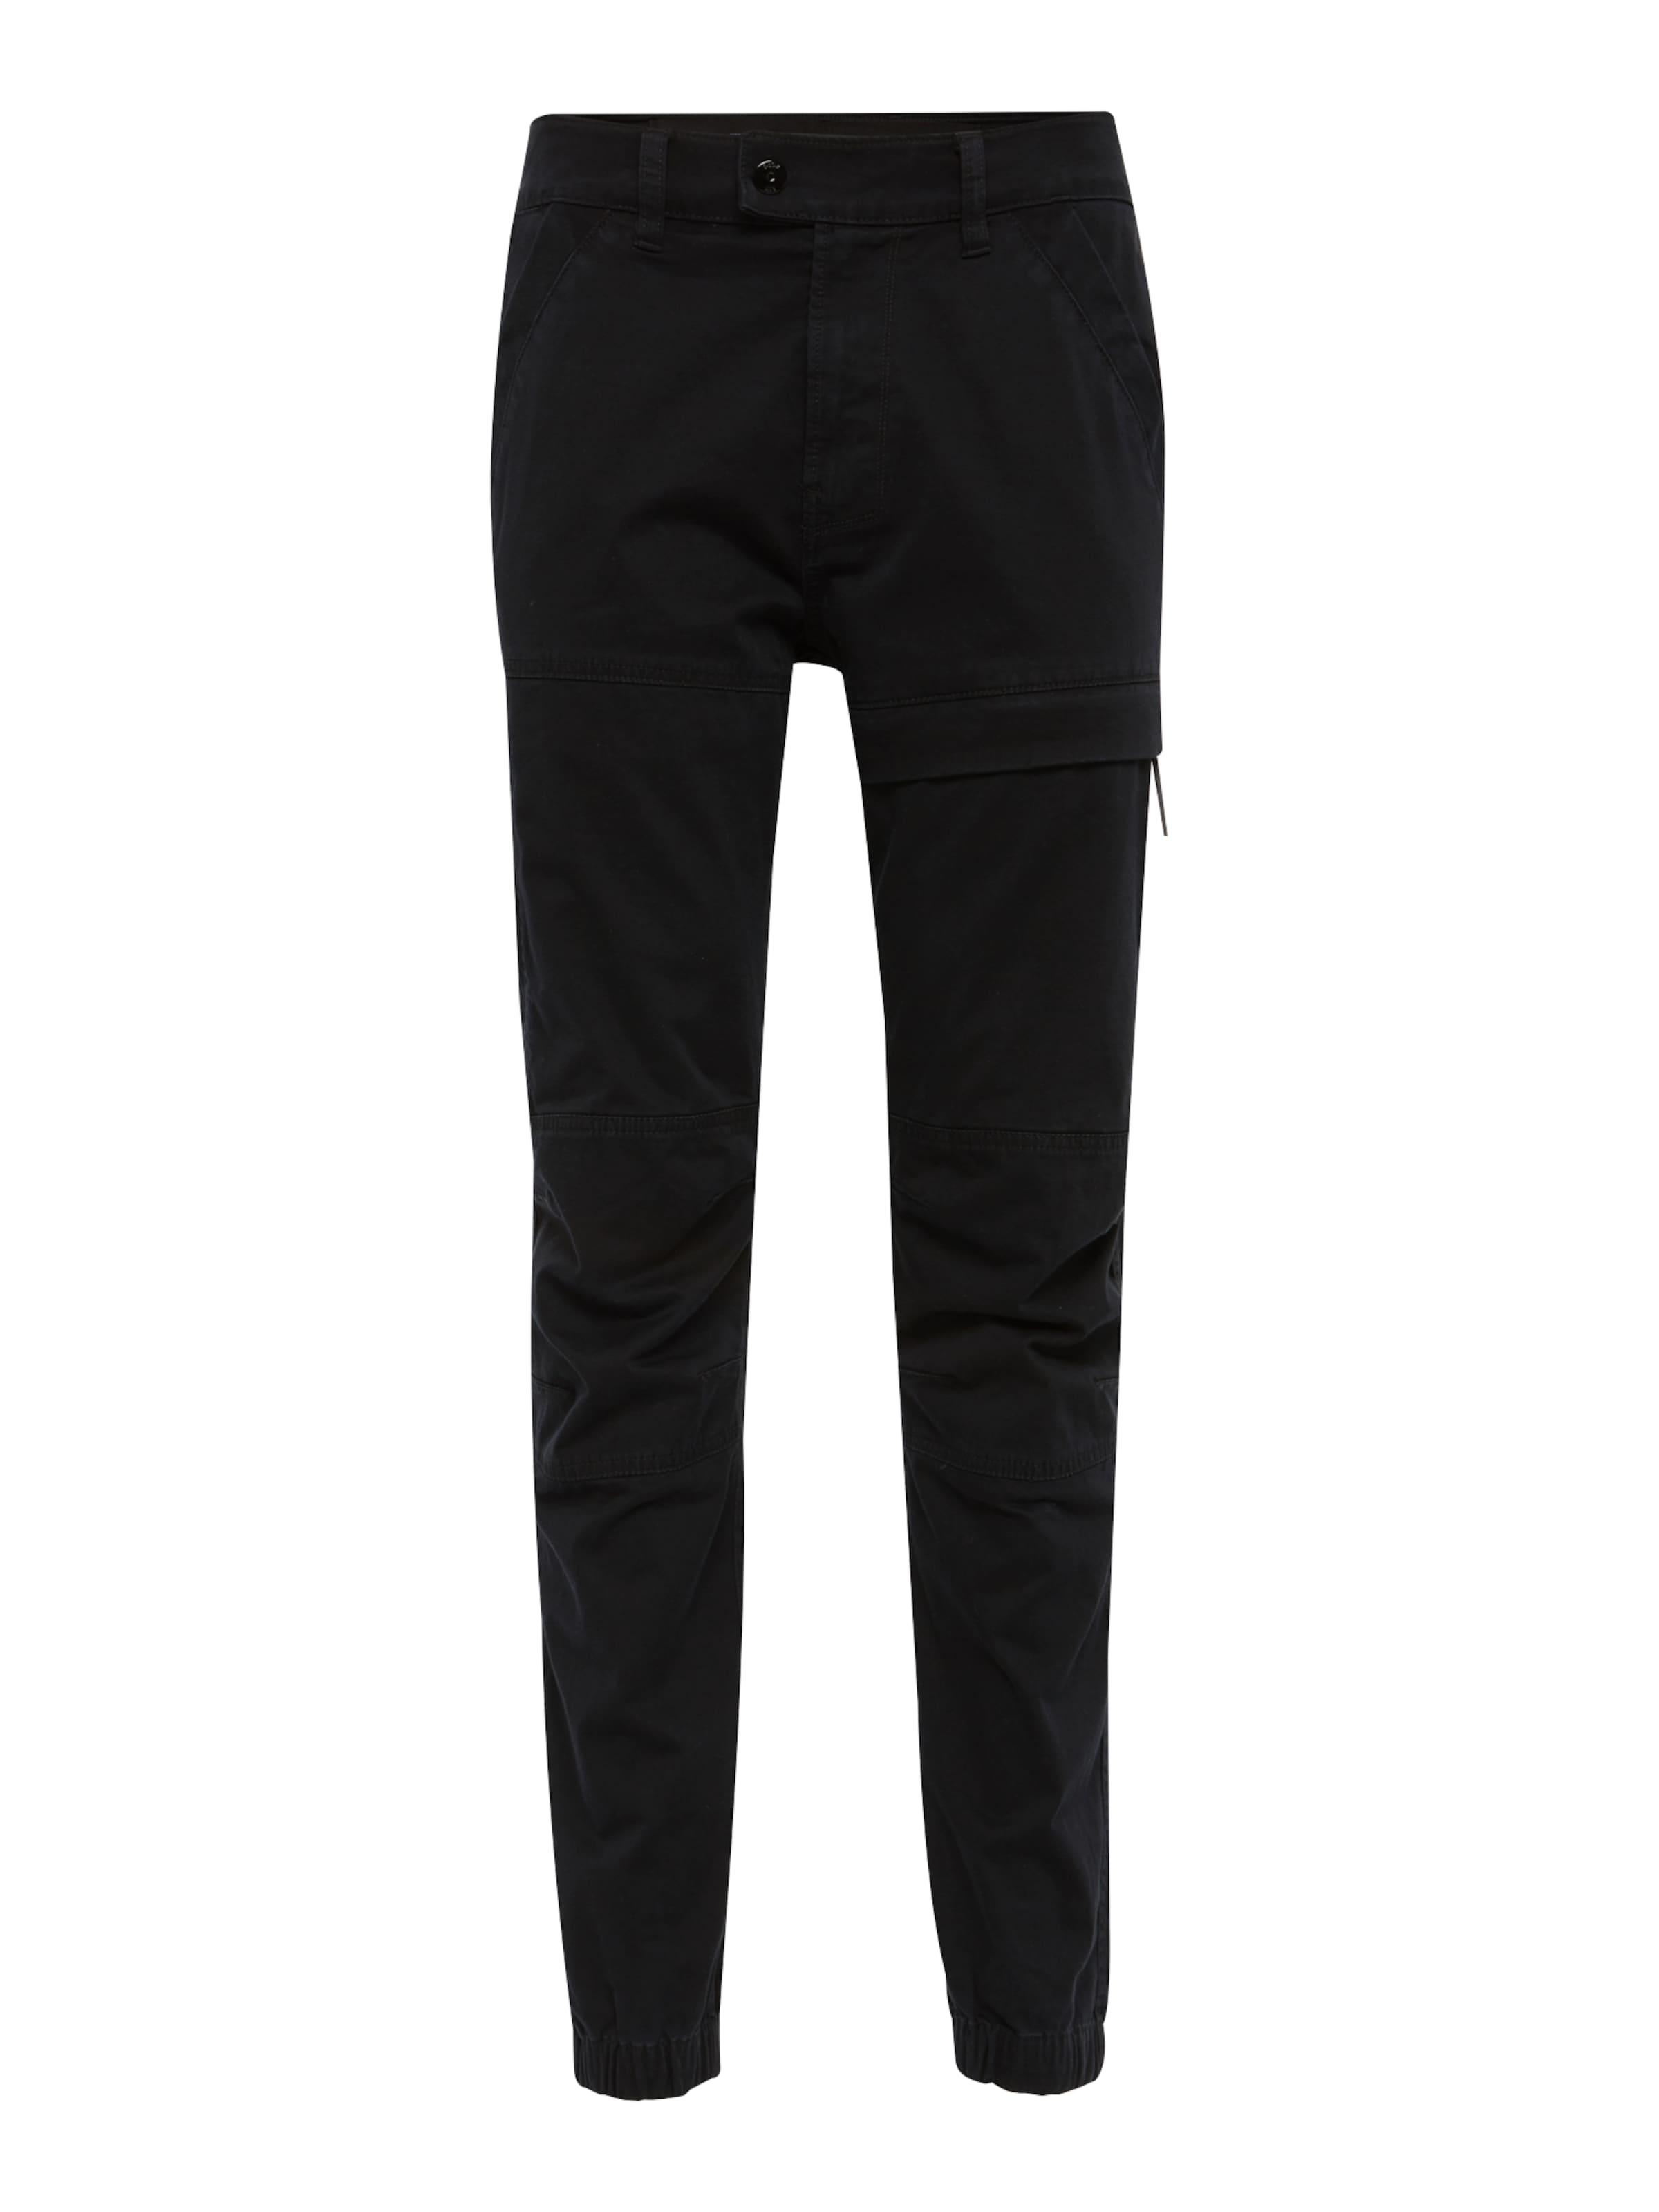 Cuffed' G Raw Pantalon Straight En Cargo Noir star 'rackam Tapered e9HDWbE2IY